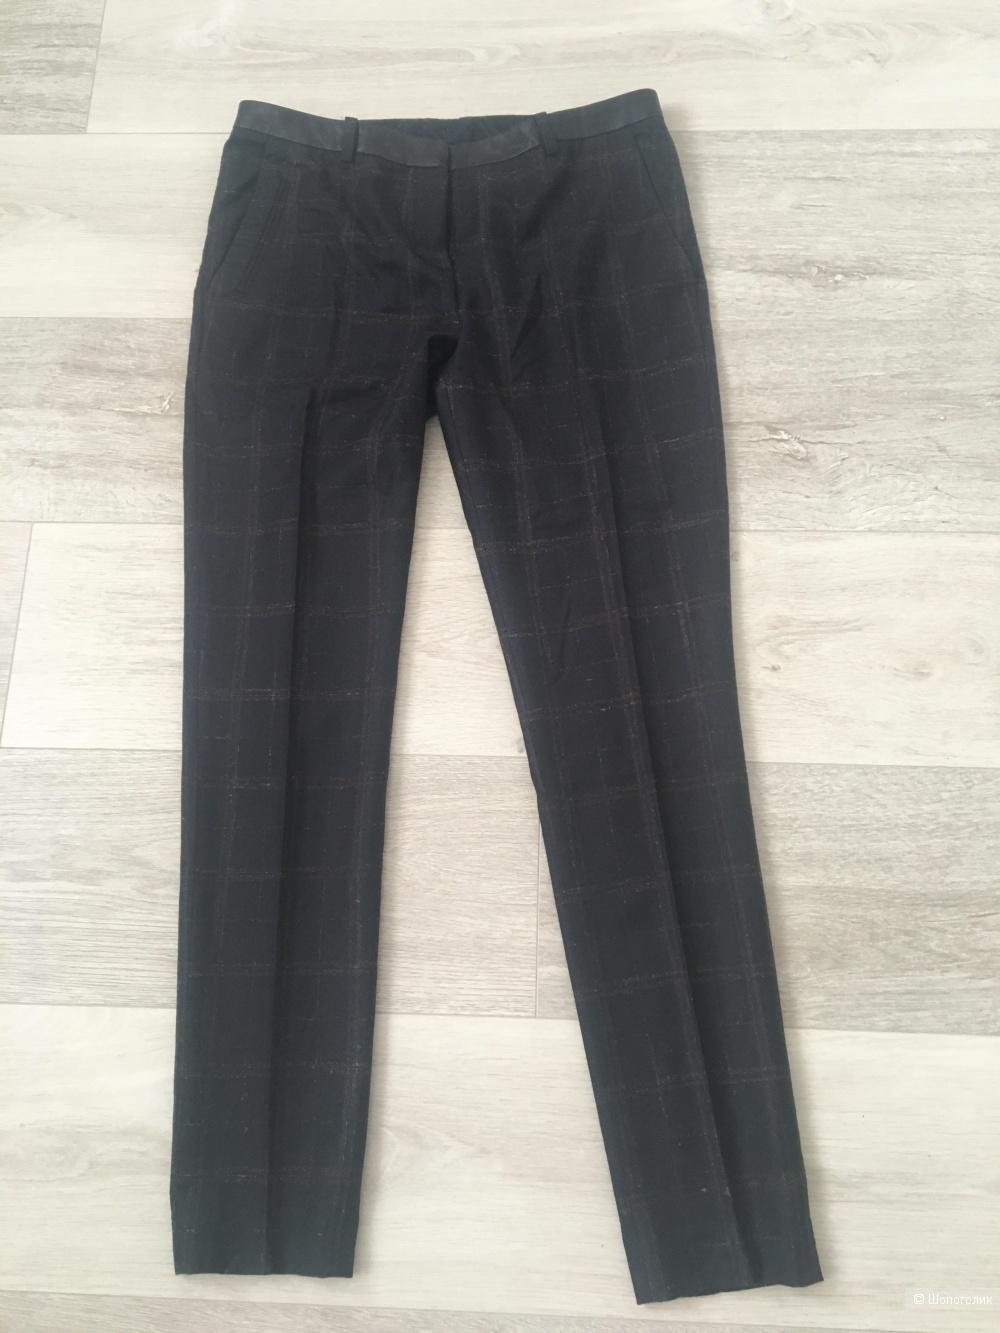 Шерстяные брюки Uterque, 42 размер